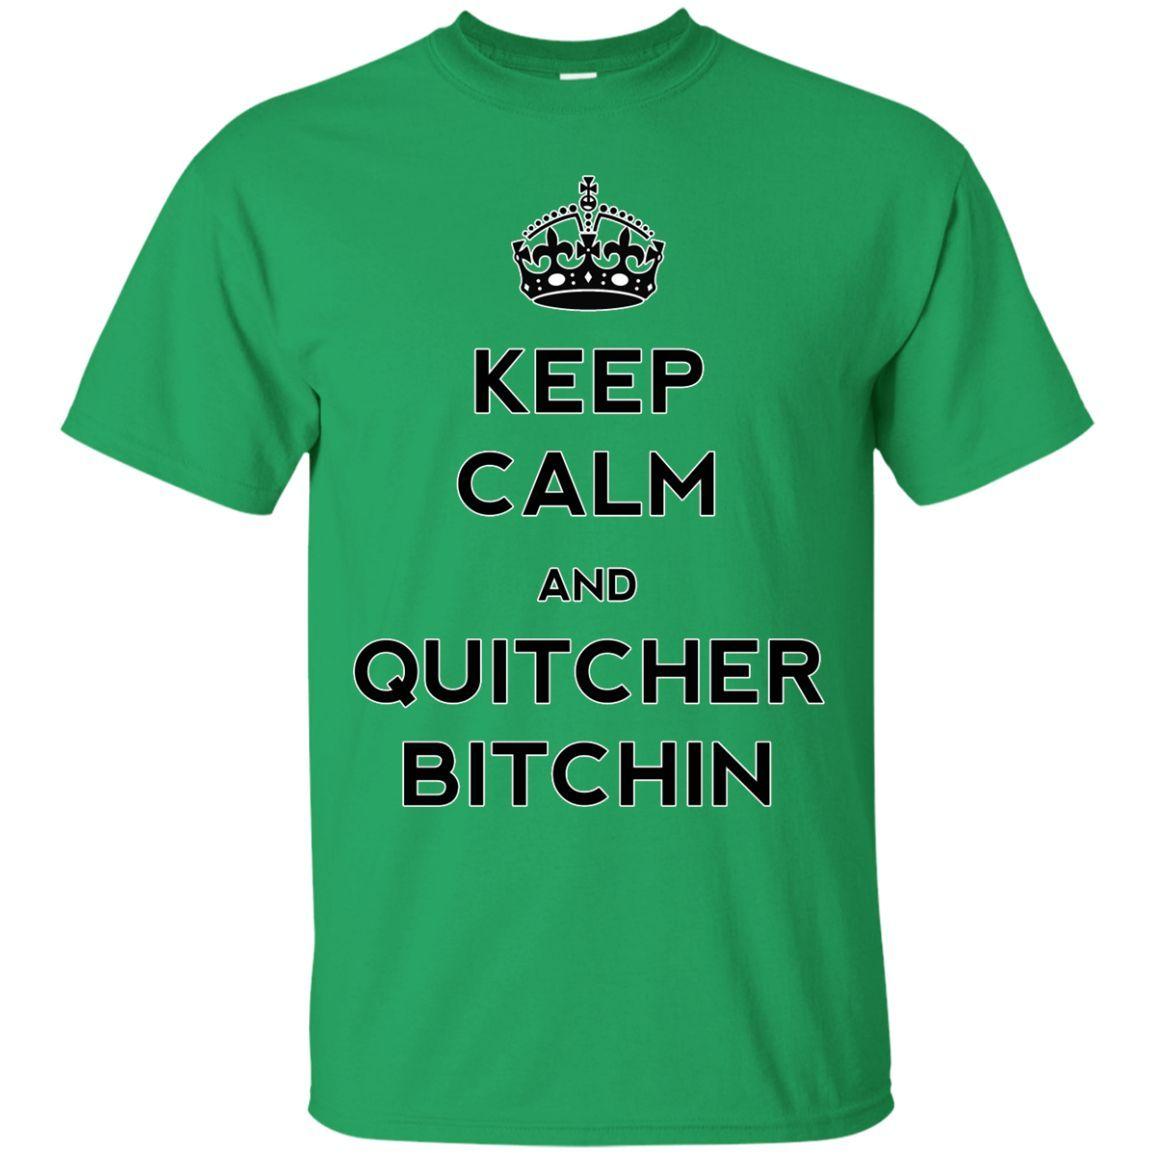 Keep Calm and Qutcher Bitchin Custom Ultra Cotton T-Shirt